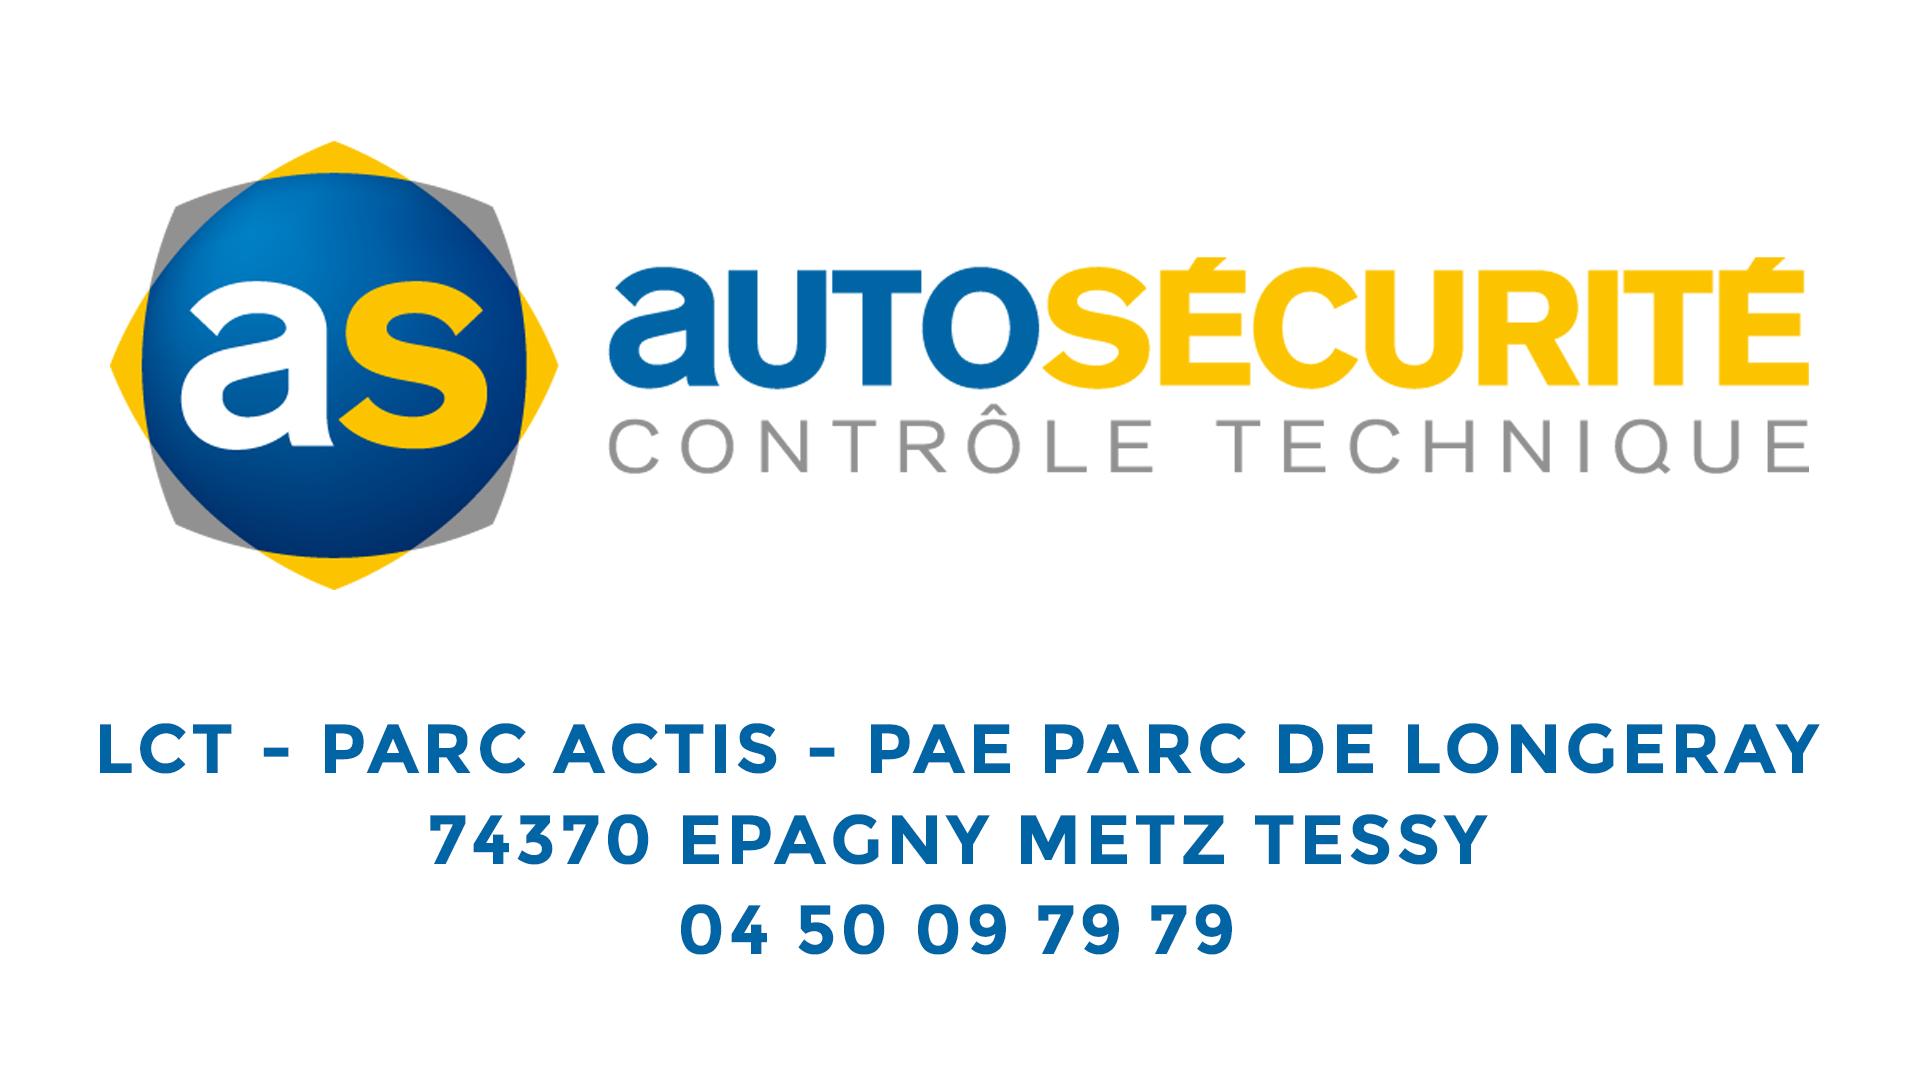 https://controle-technique-metz-tessy.autosecurite.com/alerte-gratuite/